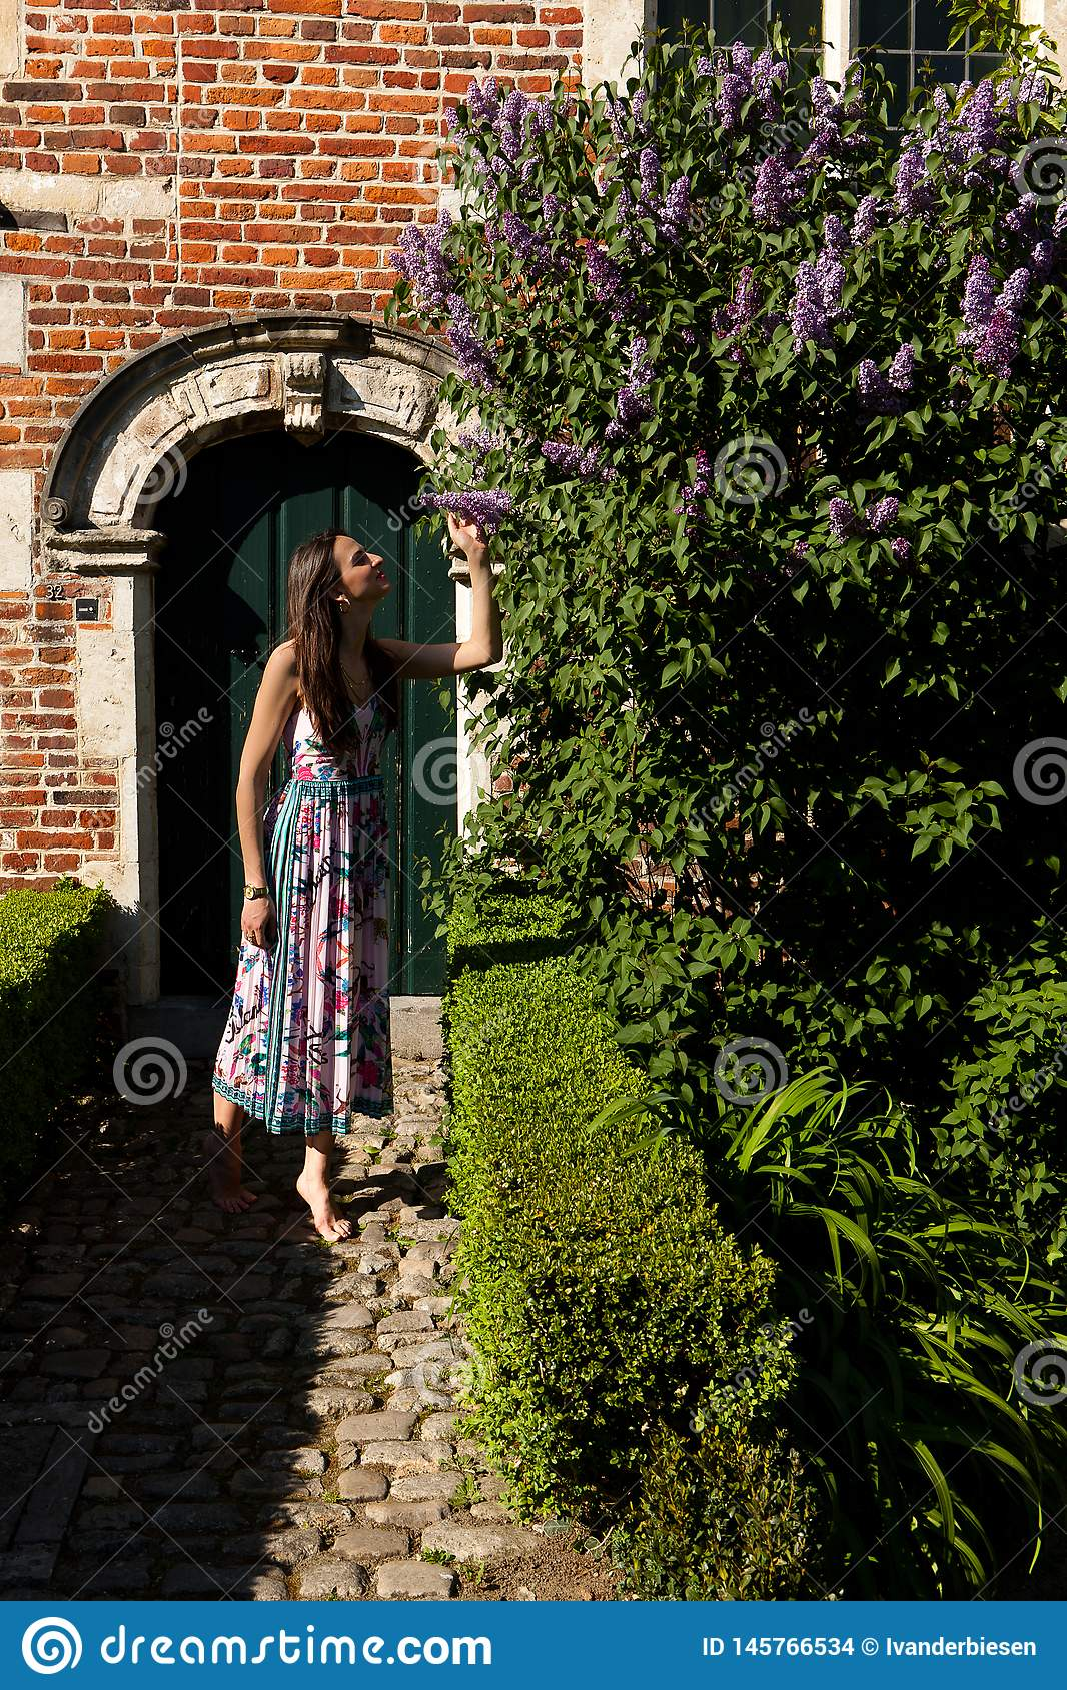 Puerta de la pared del syringa de la lila del sol de la mujer, Groot Begijnhof, Lovaina, Bélgica